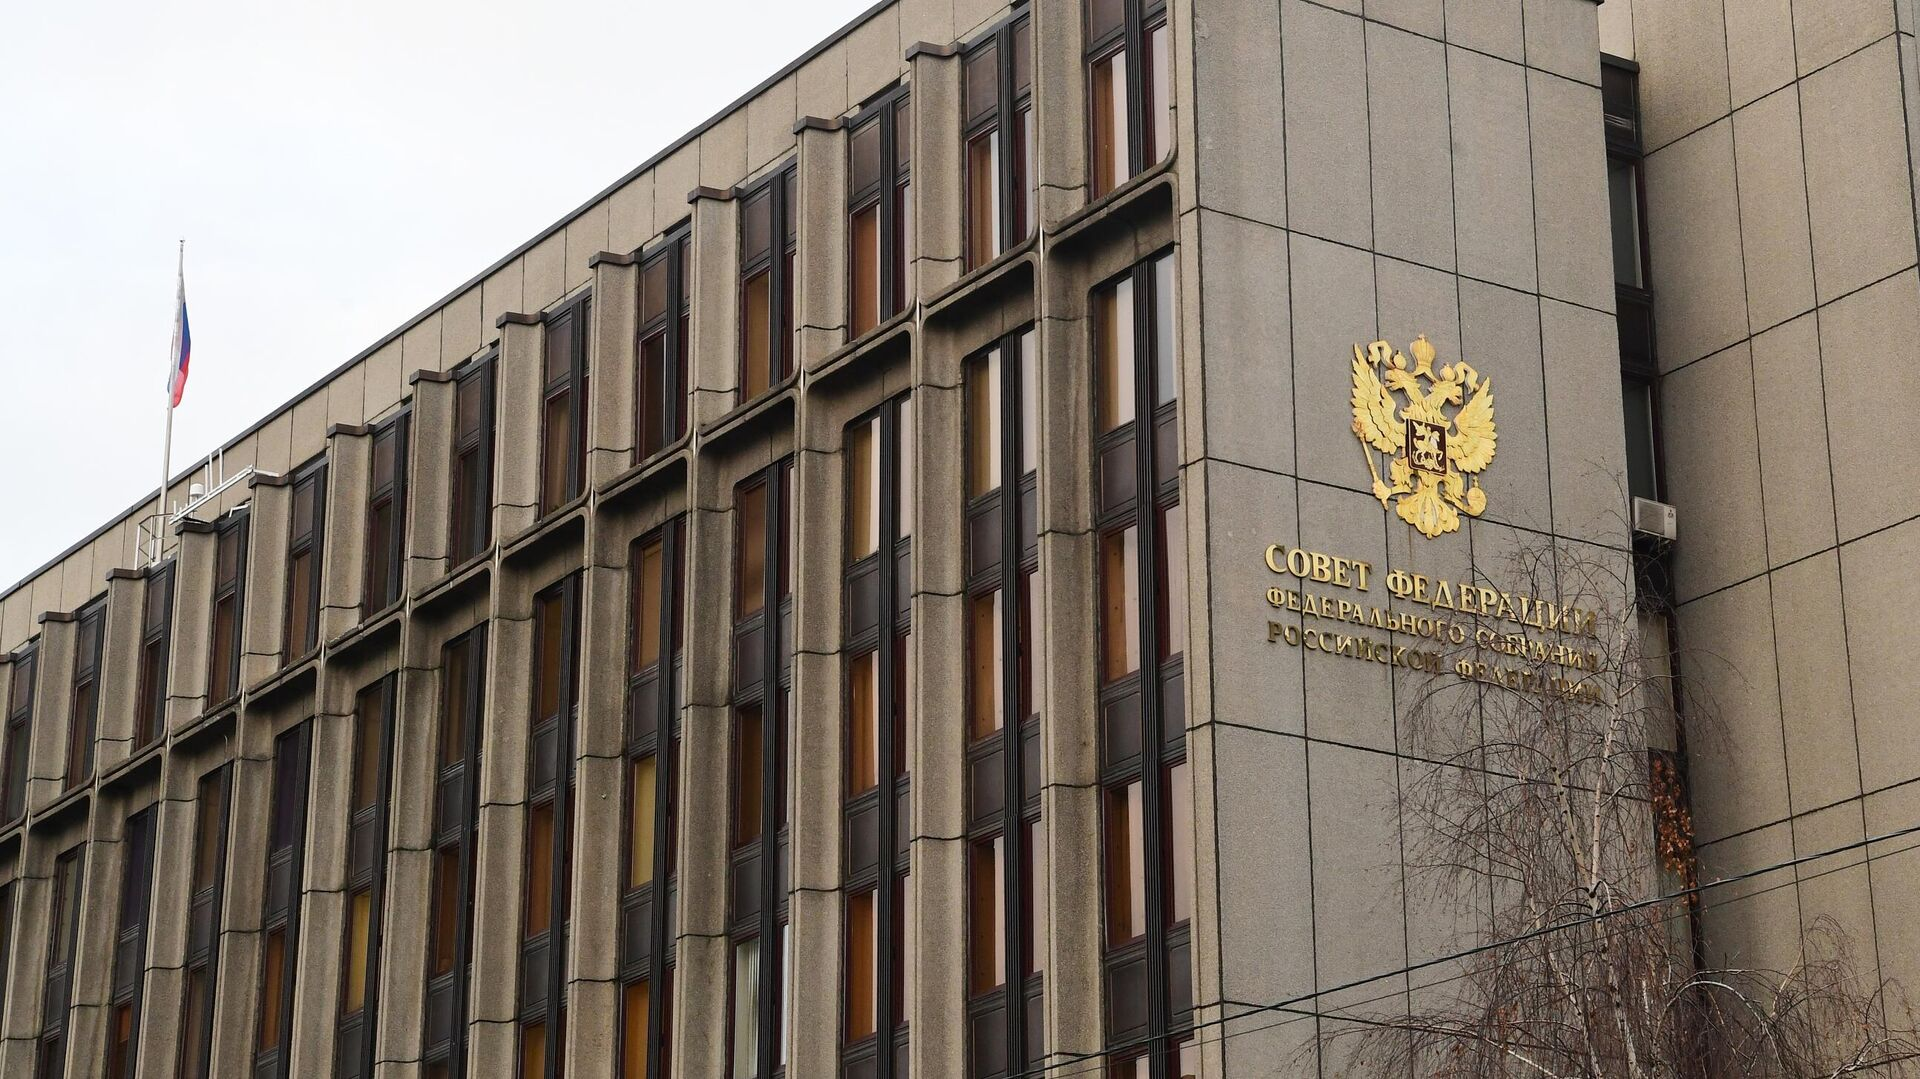 Здание Совета Федерации РФ в Москве - РИА Новости, 1920, 21.04.2021